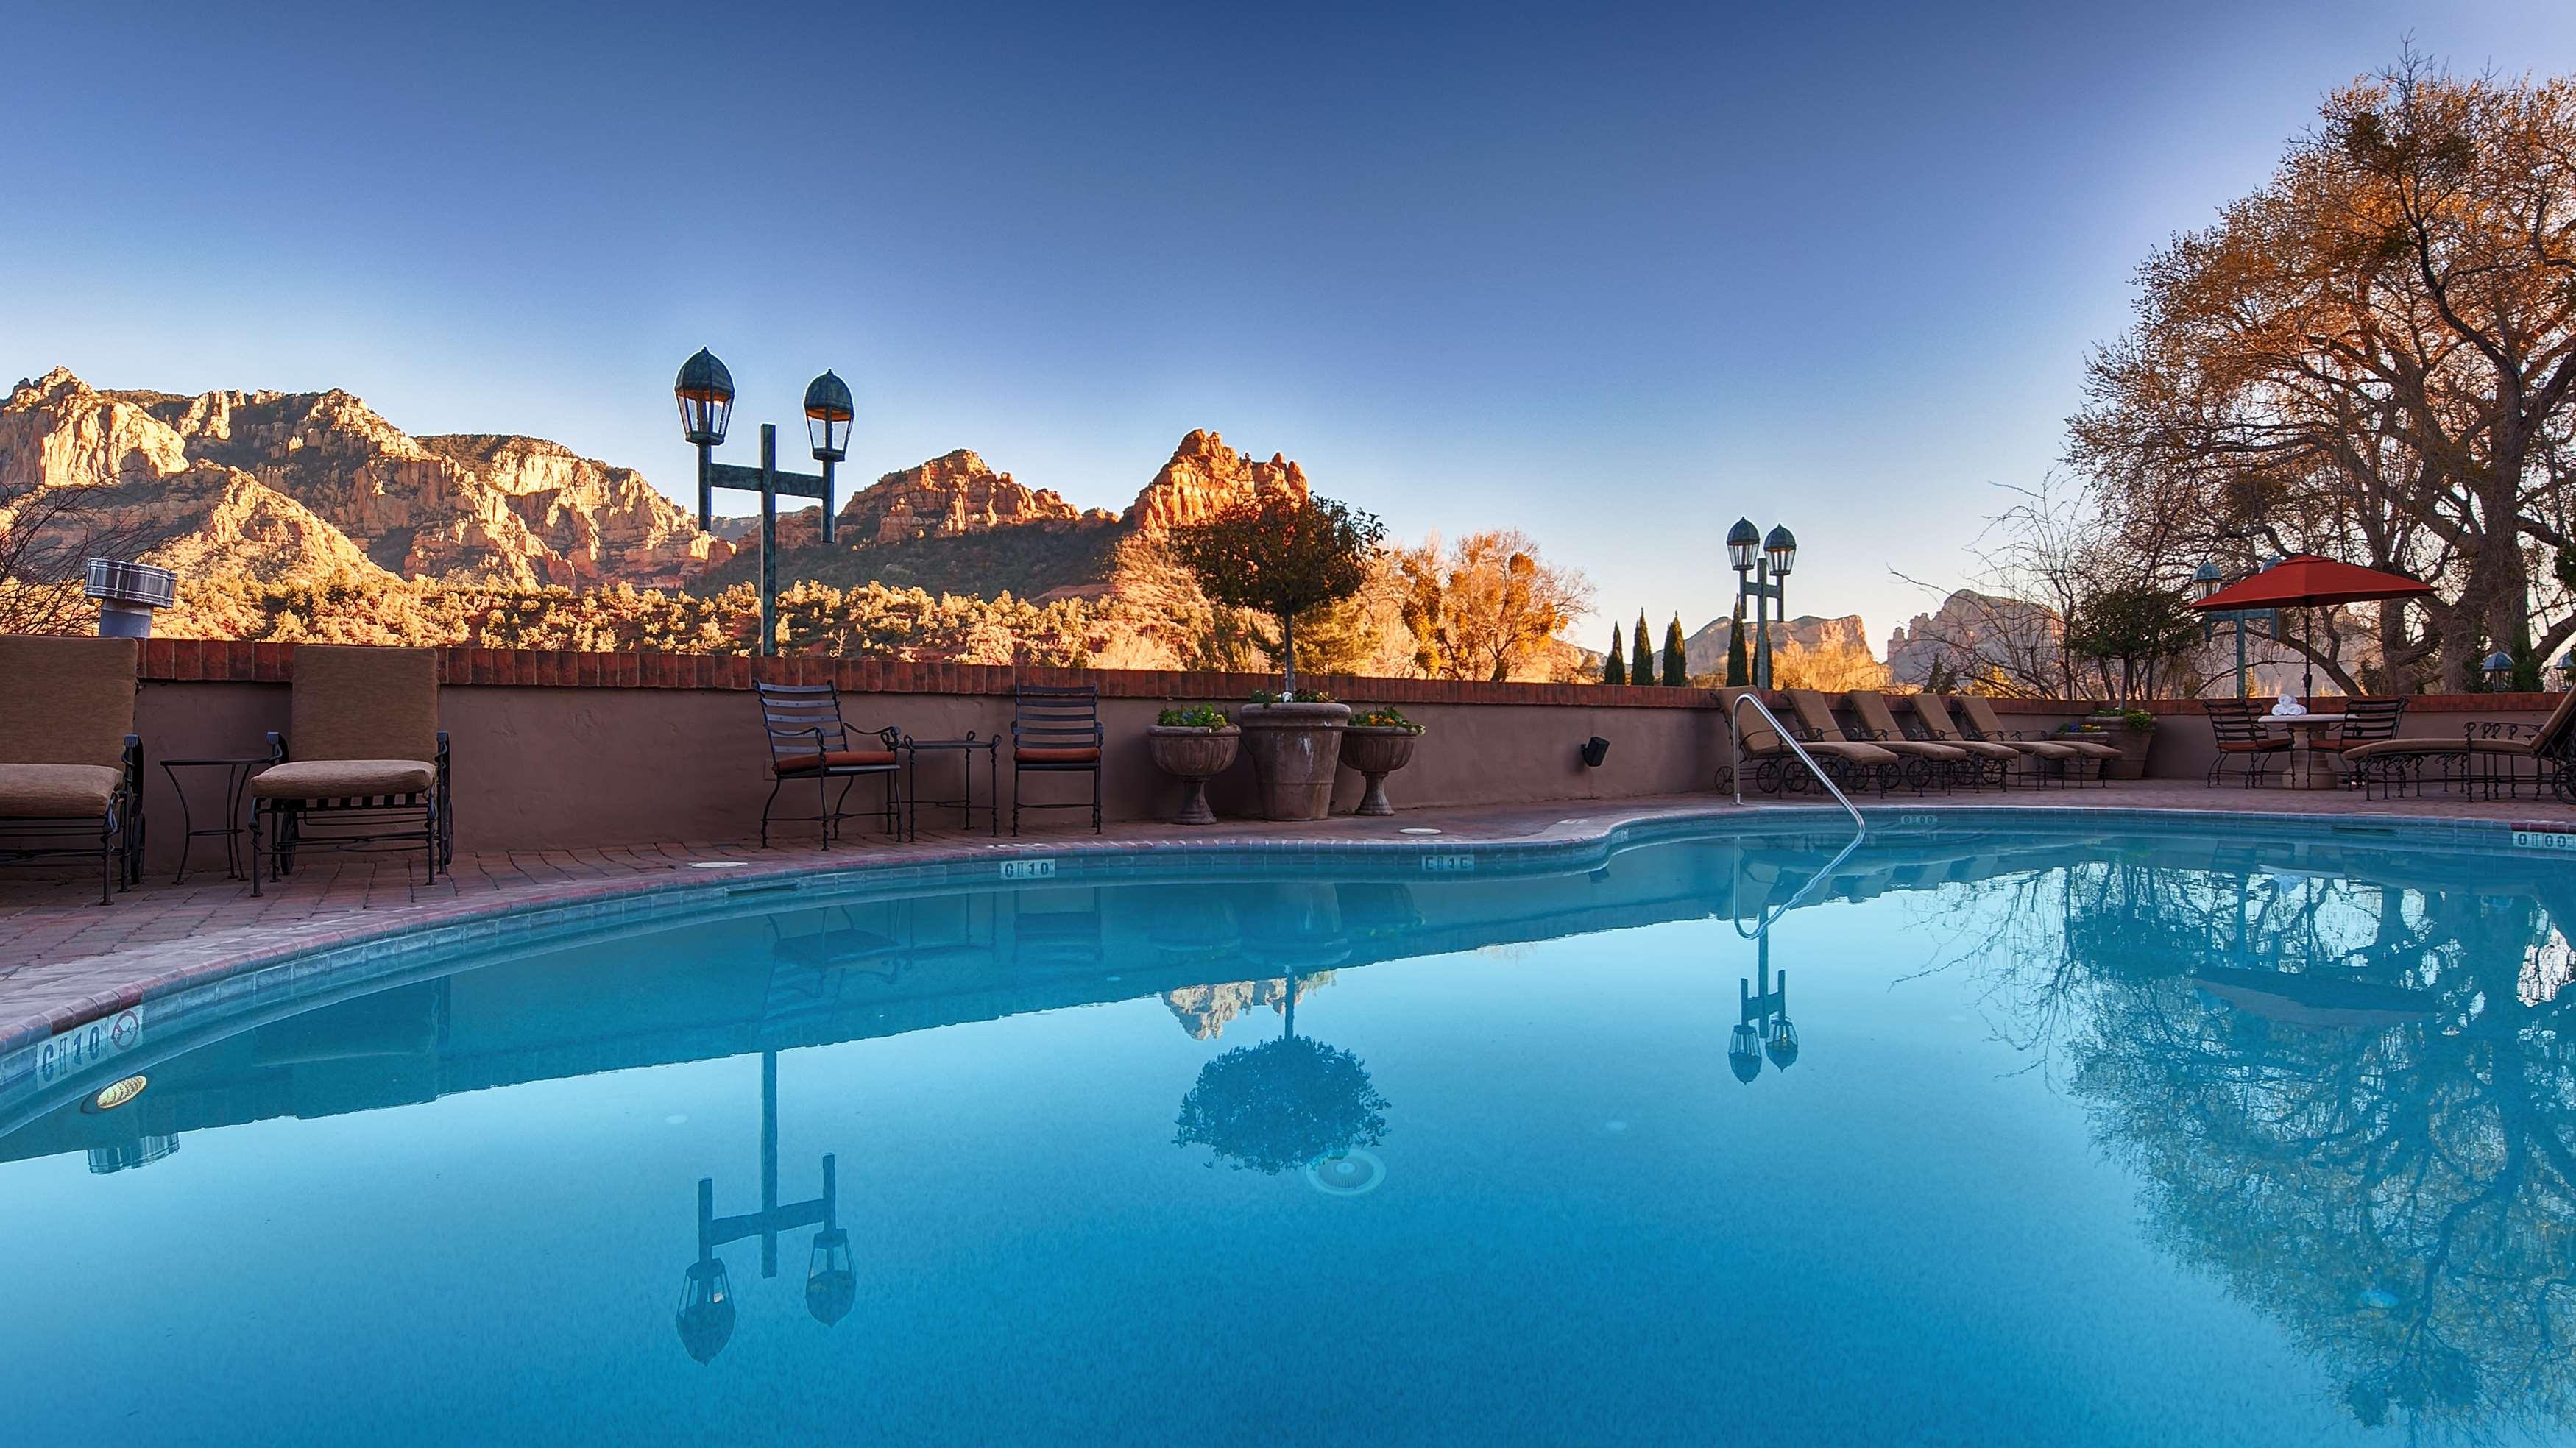 Best Western Plus Arroyo Roble Hotel & Creekside Villas image 13